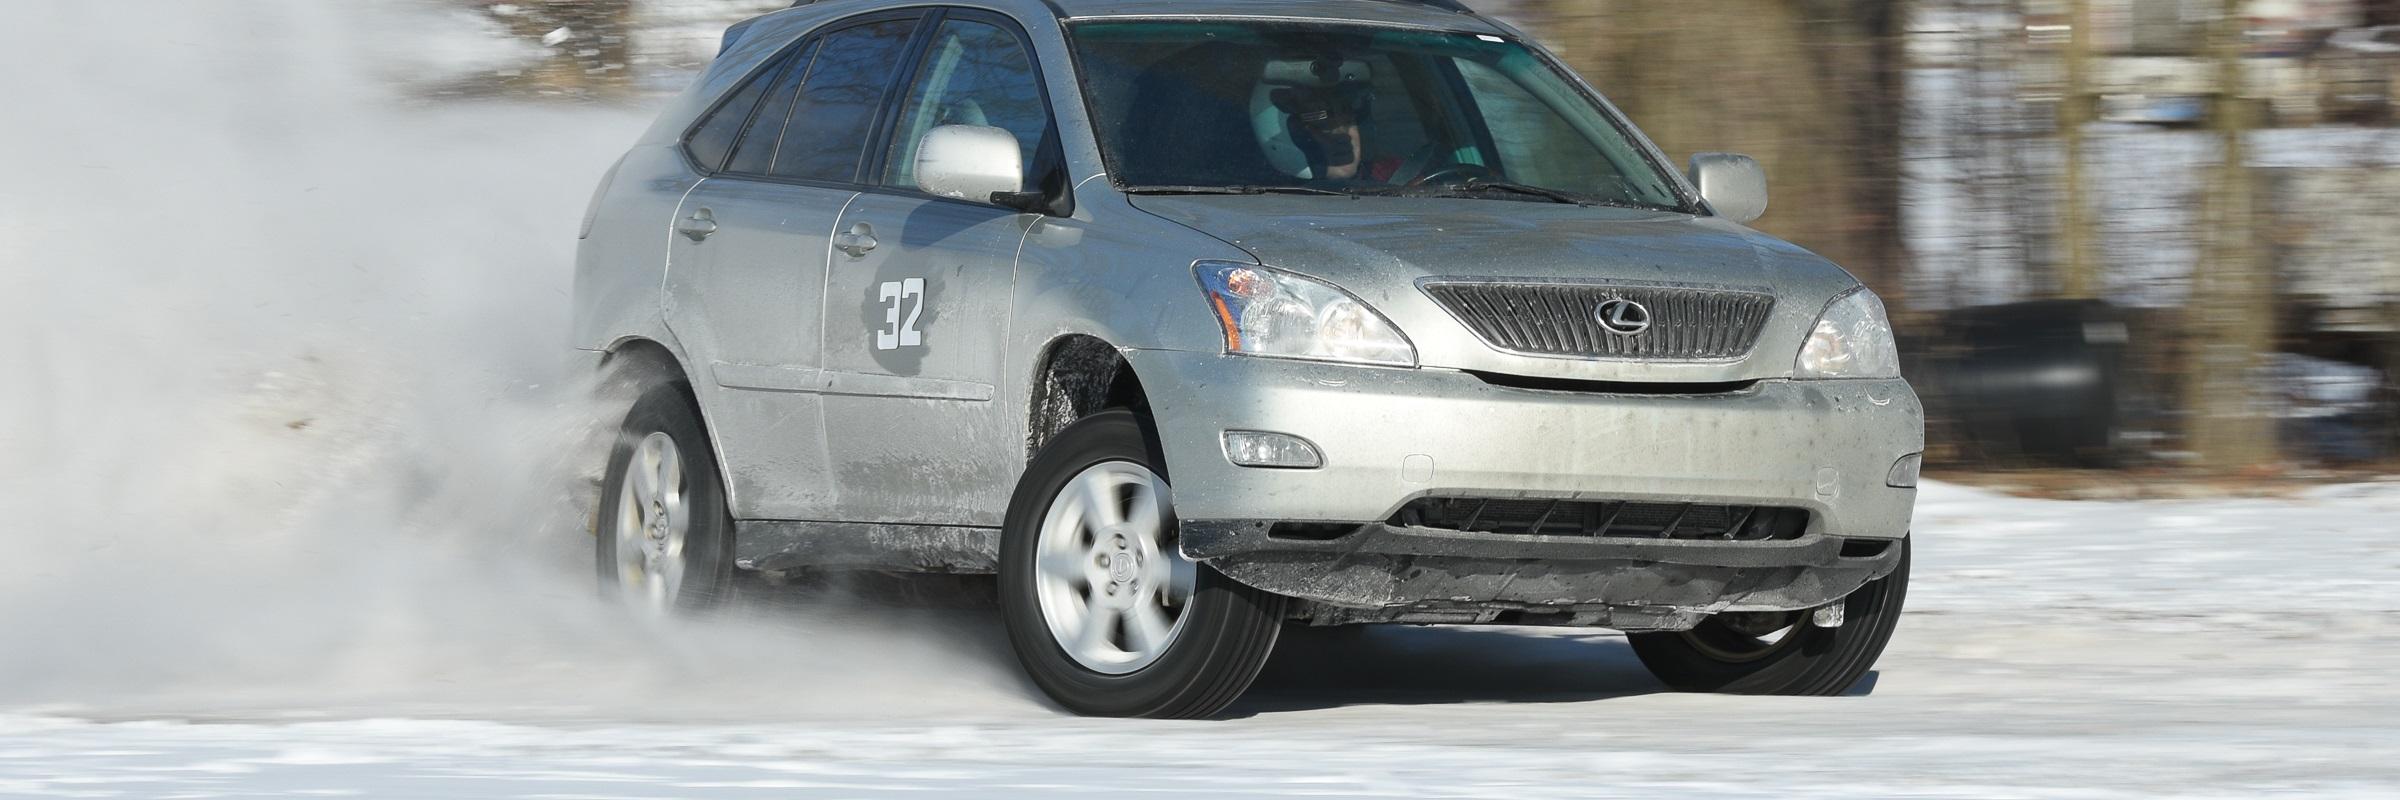 Photos From January RallyCross